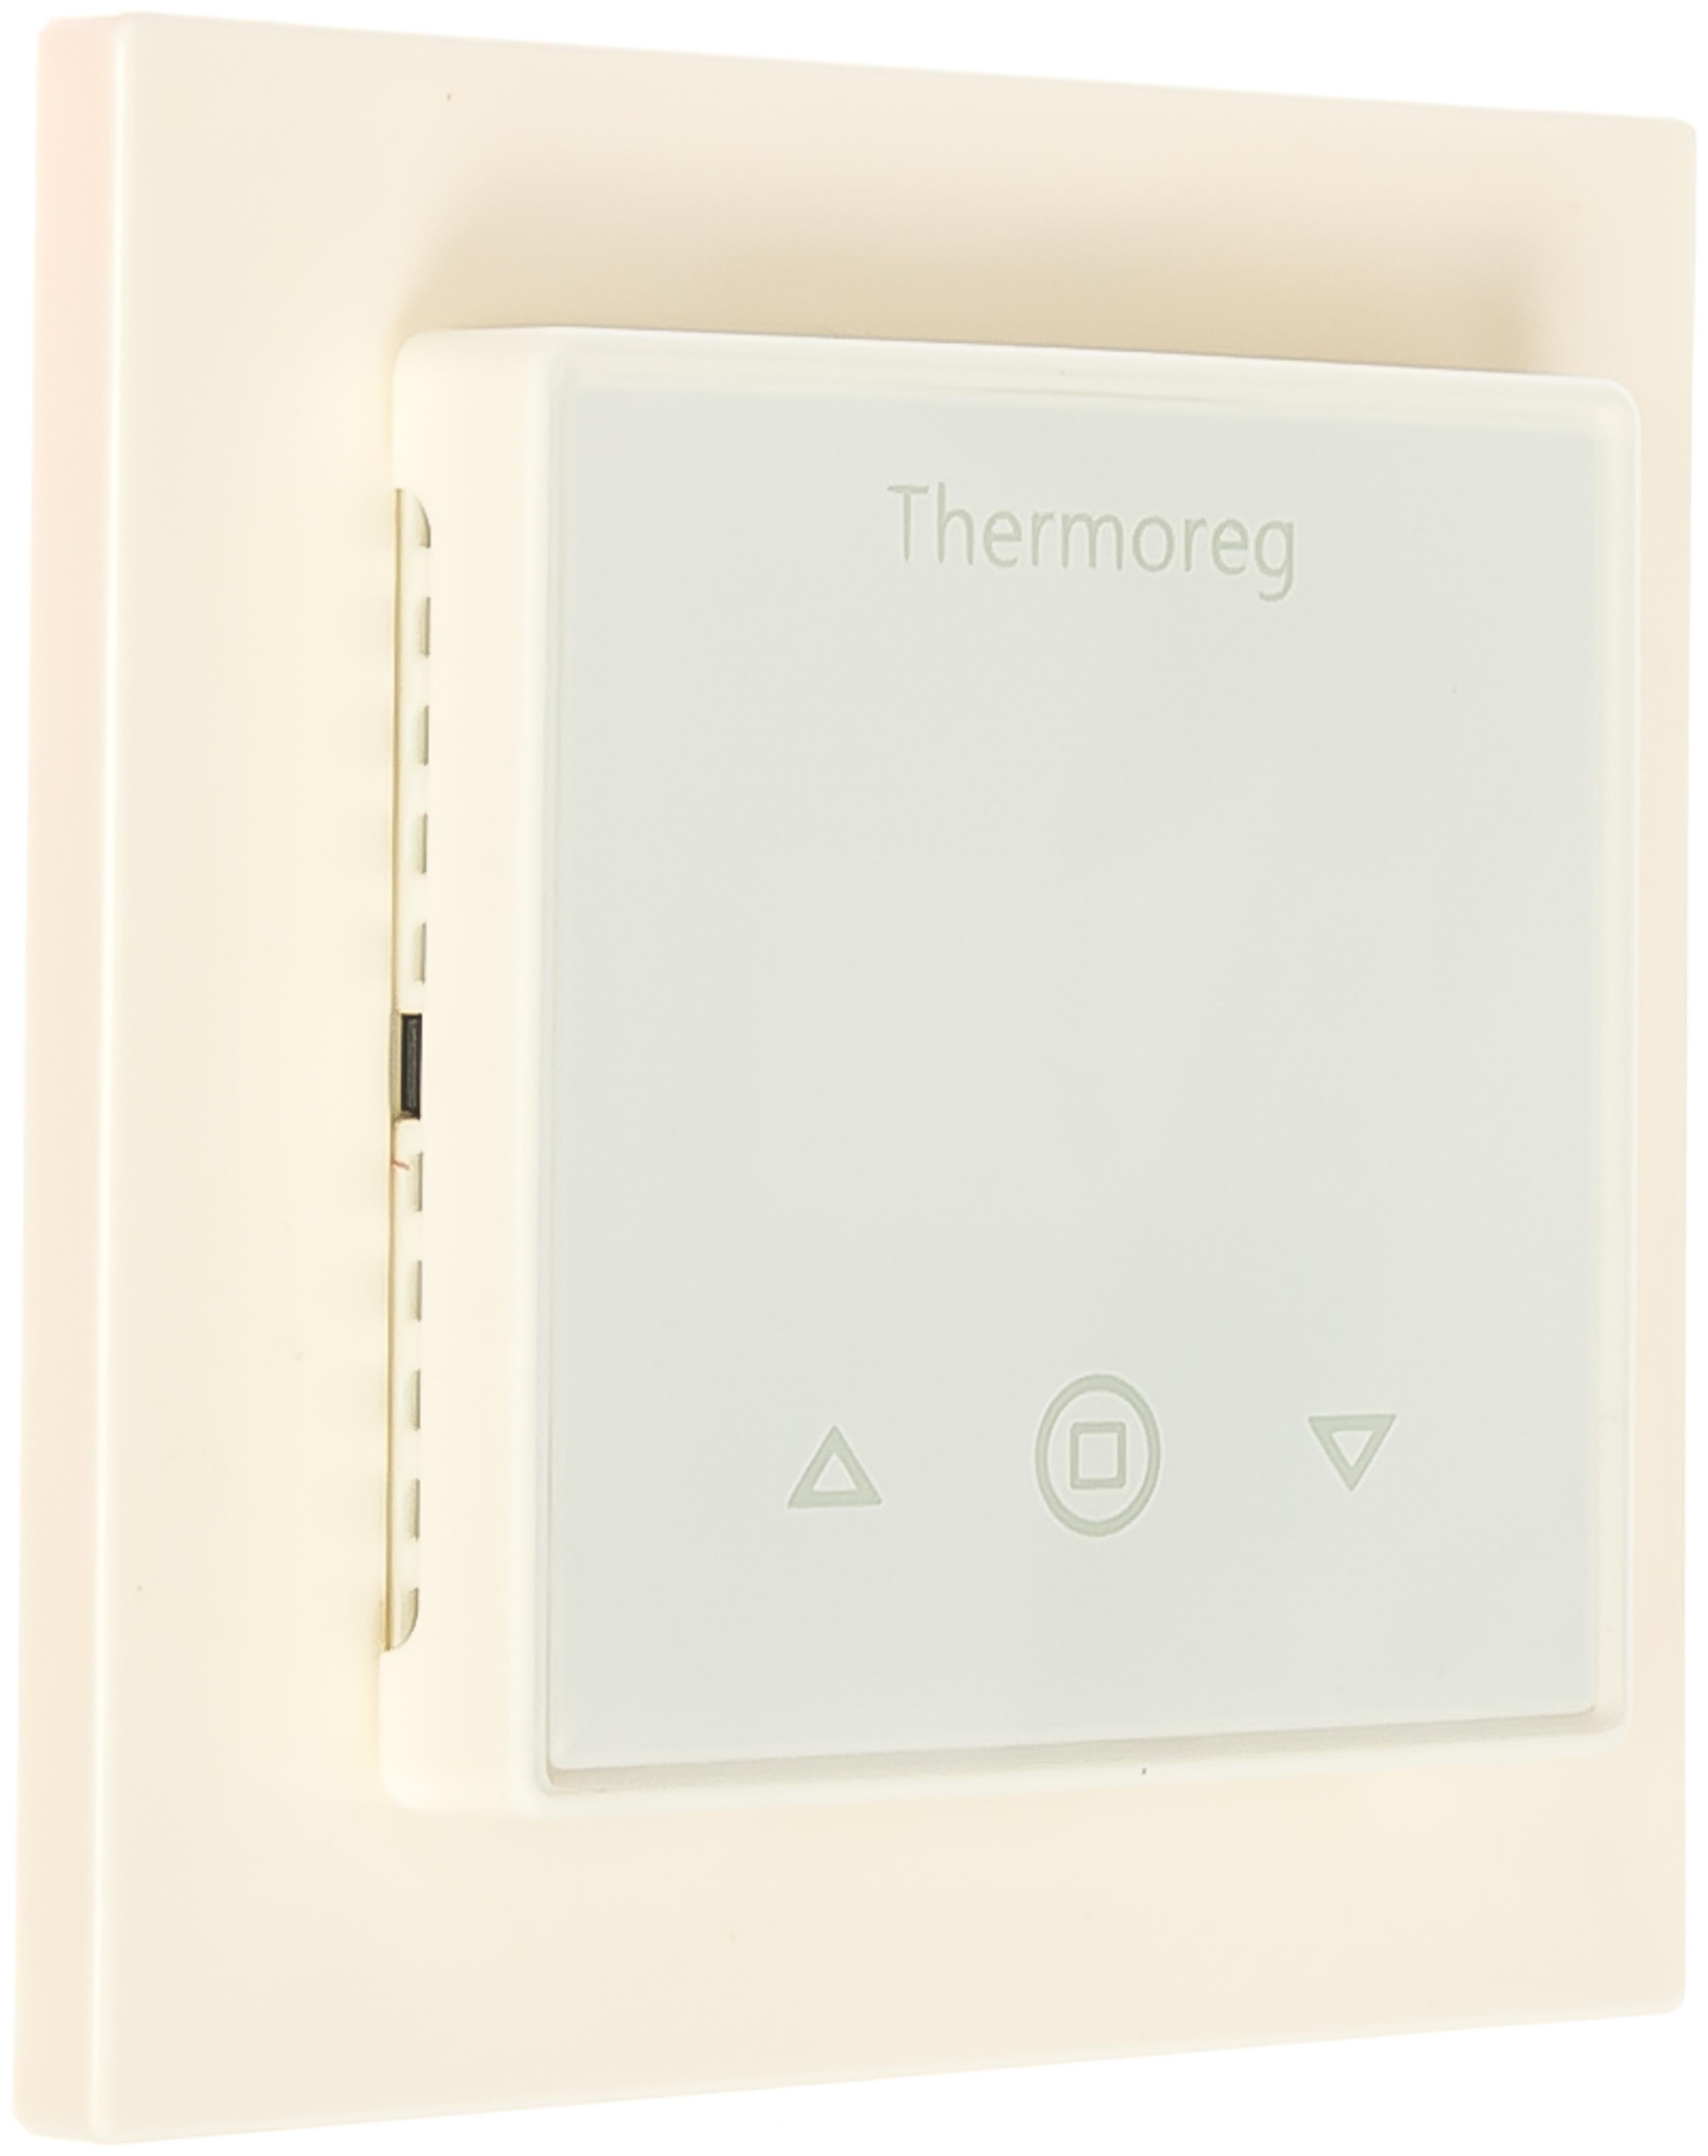 Терморегулятор Thermoreg TI-300 Thermo 350049070858